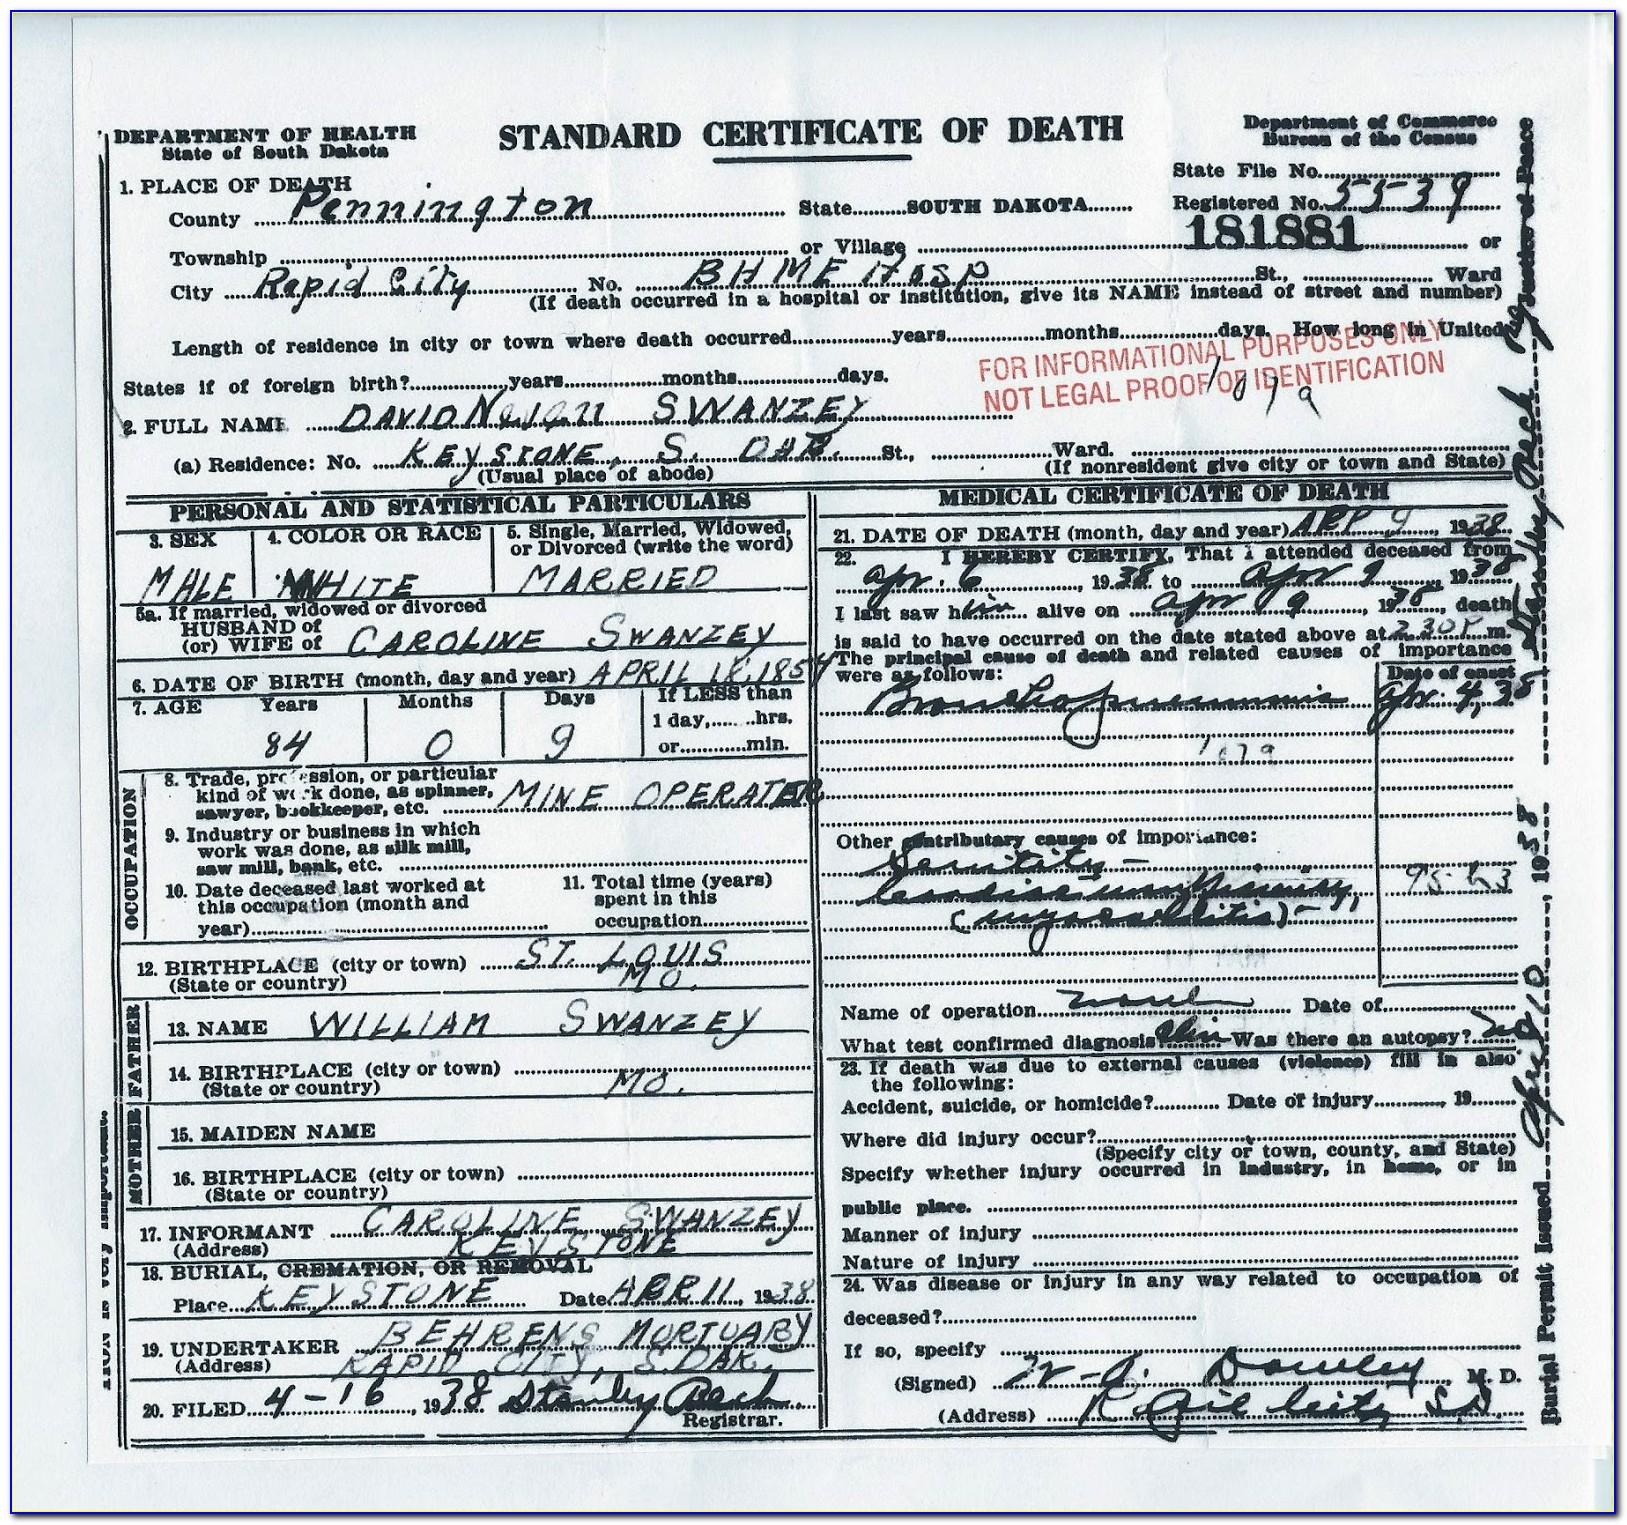 Alameda County Death Certificate Cost